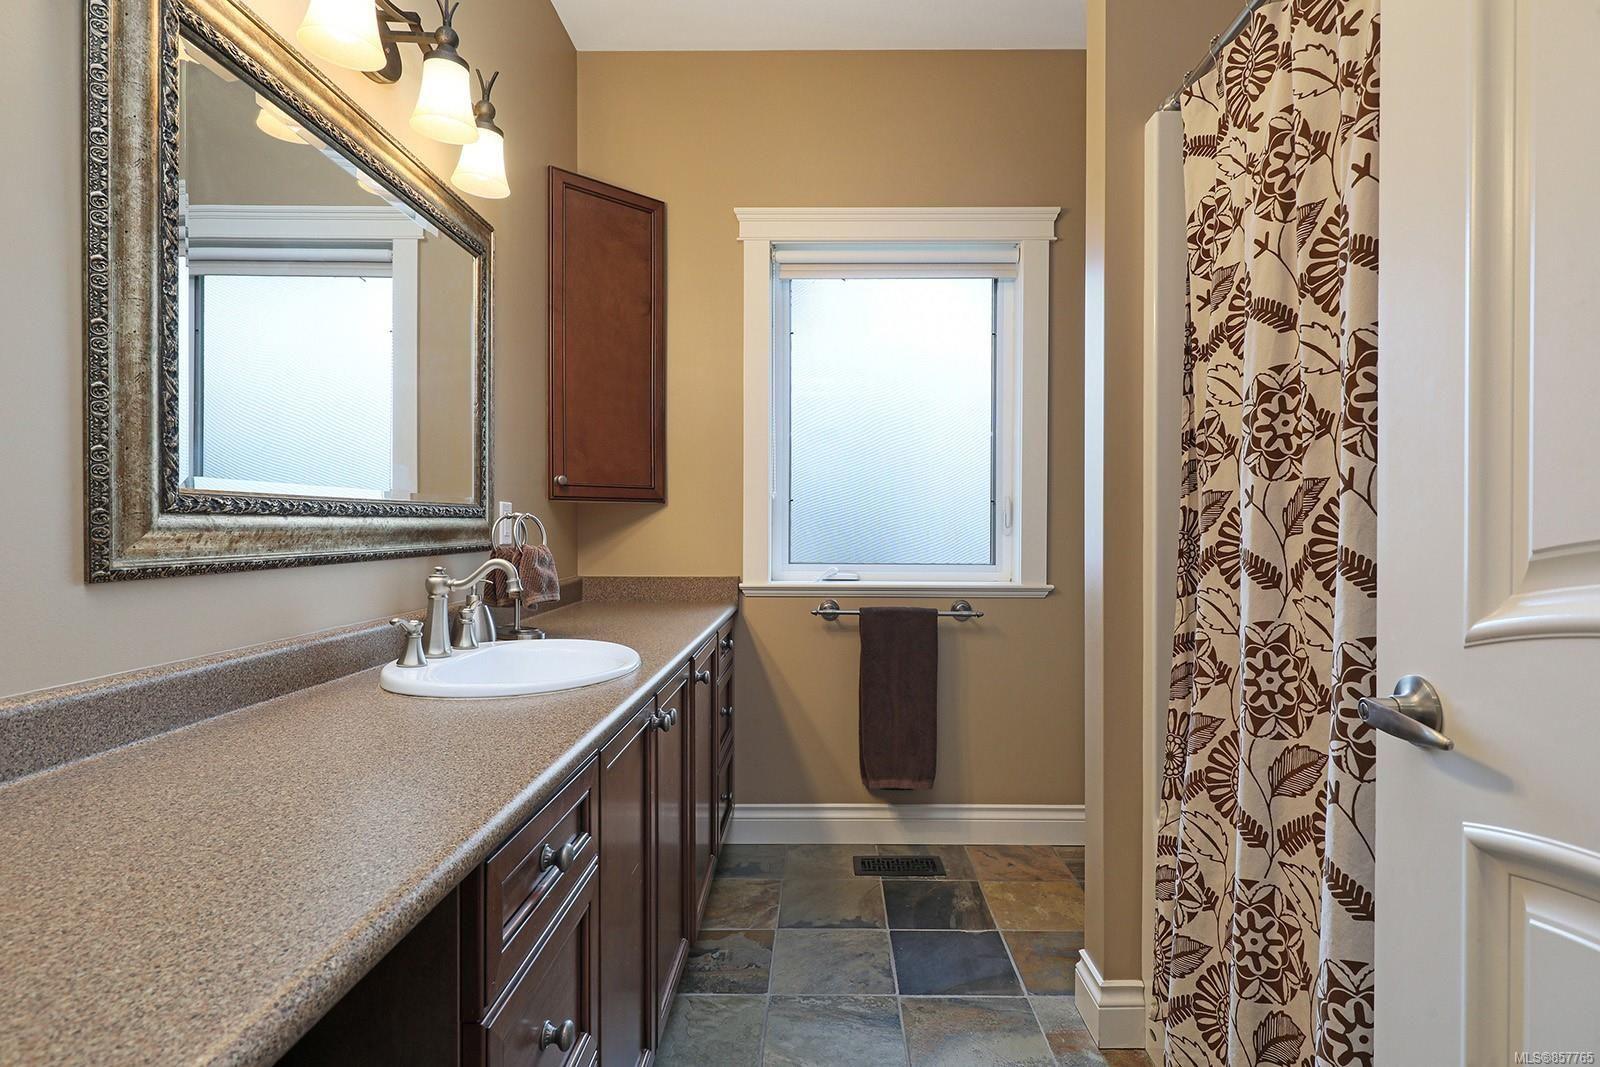 Photo 33: Photos: 1516 Highridge Dr in : CV Comox (Town of) House for sale (Comox Valley)  : MLS®# 857765